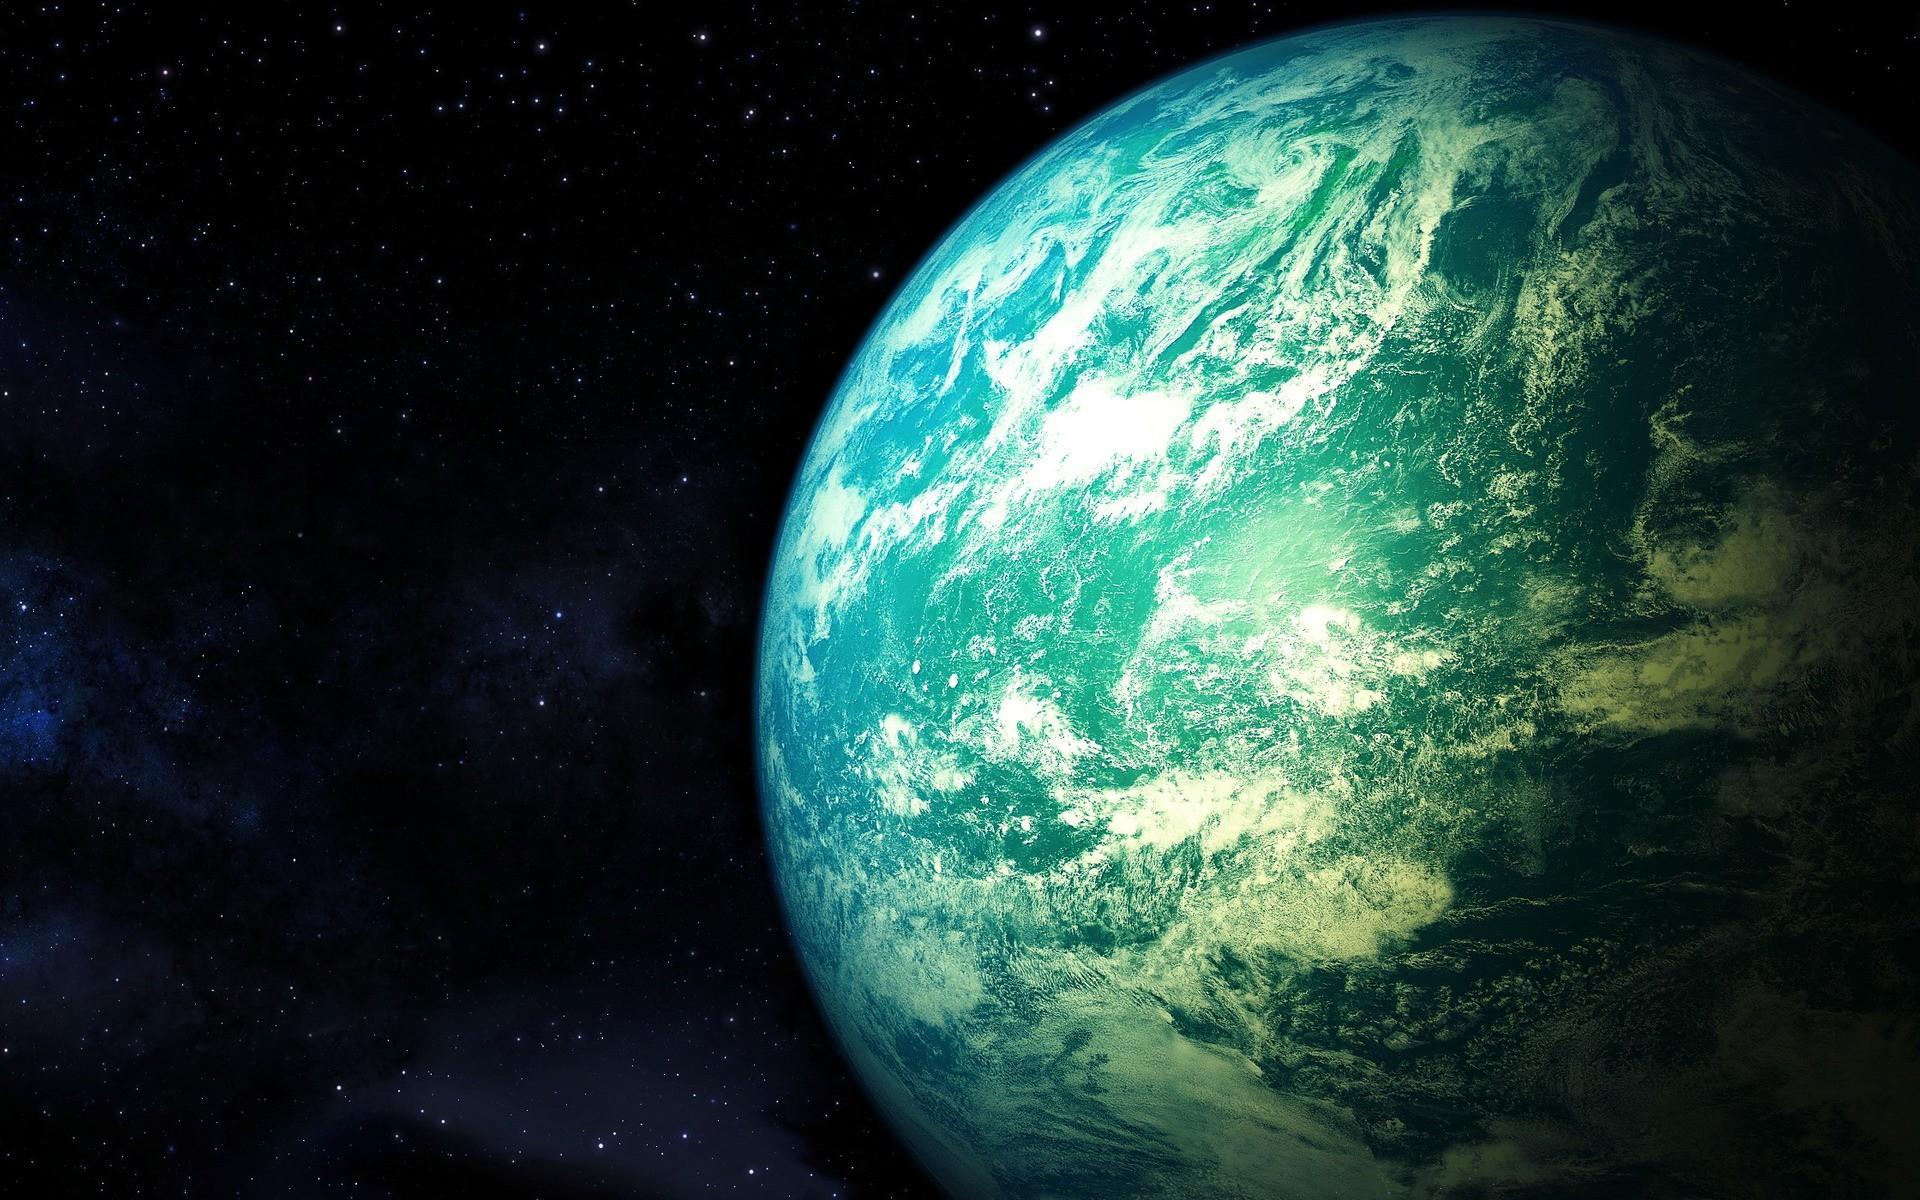 Google themes earth - Earth Is Amazing Google Themes Earth Is Amazing Google Wallpapers